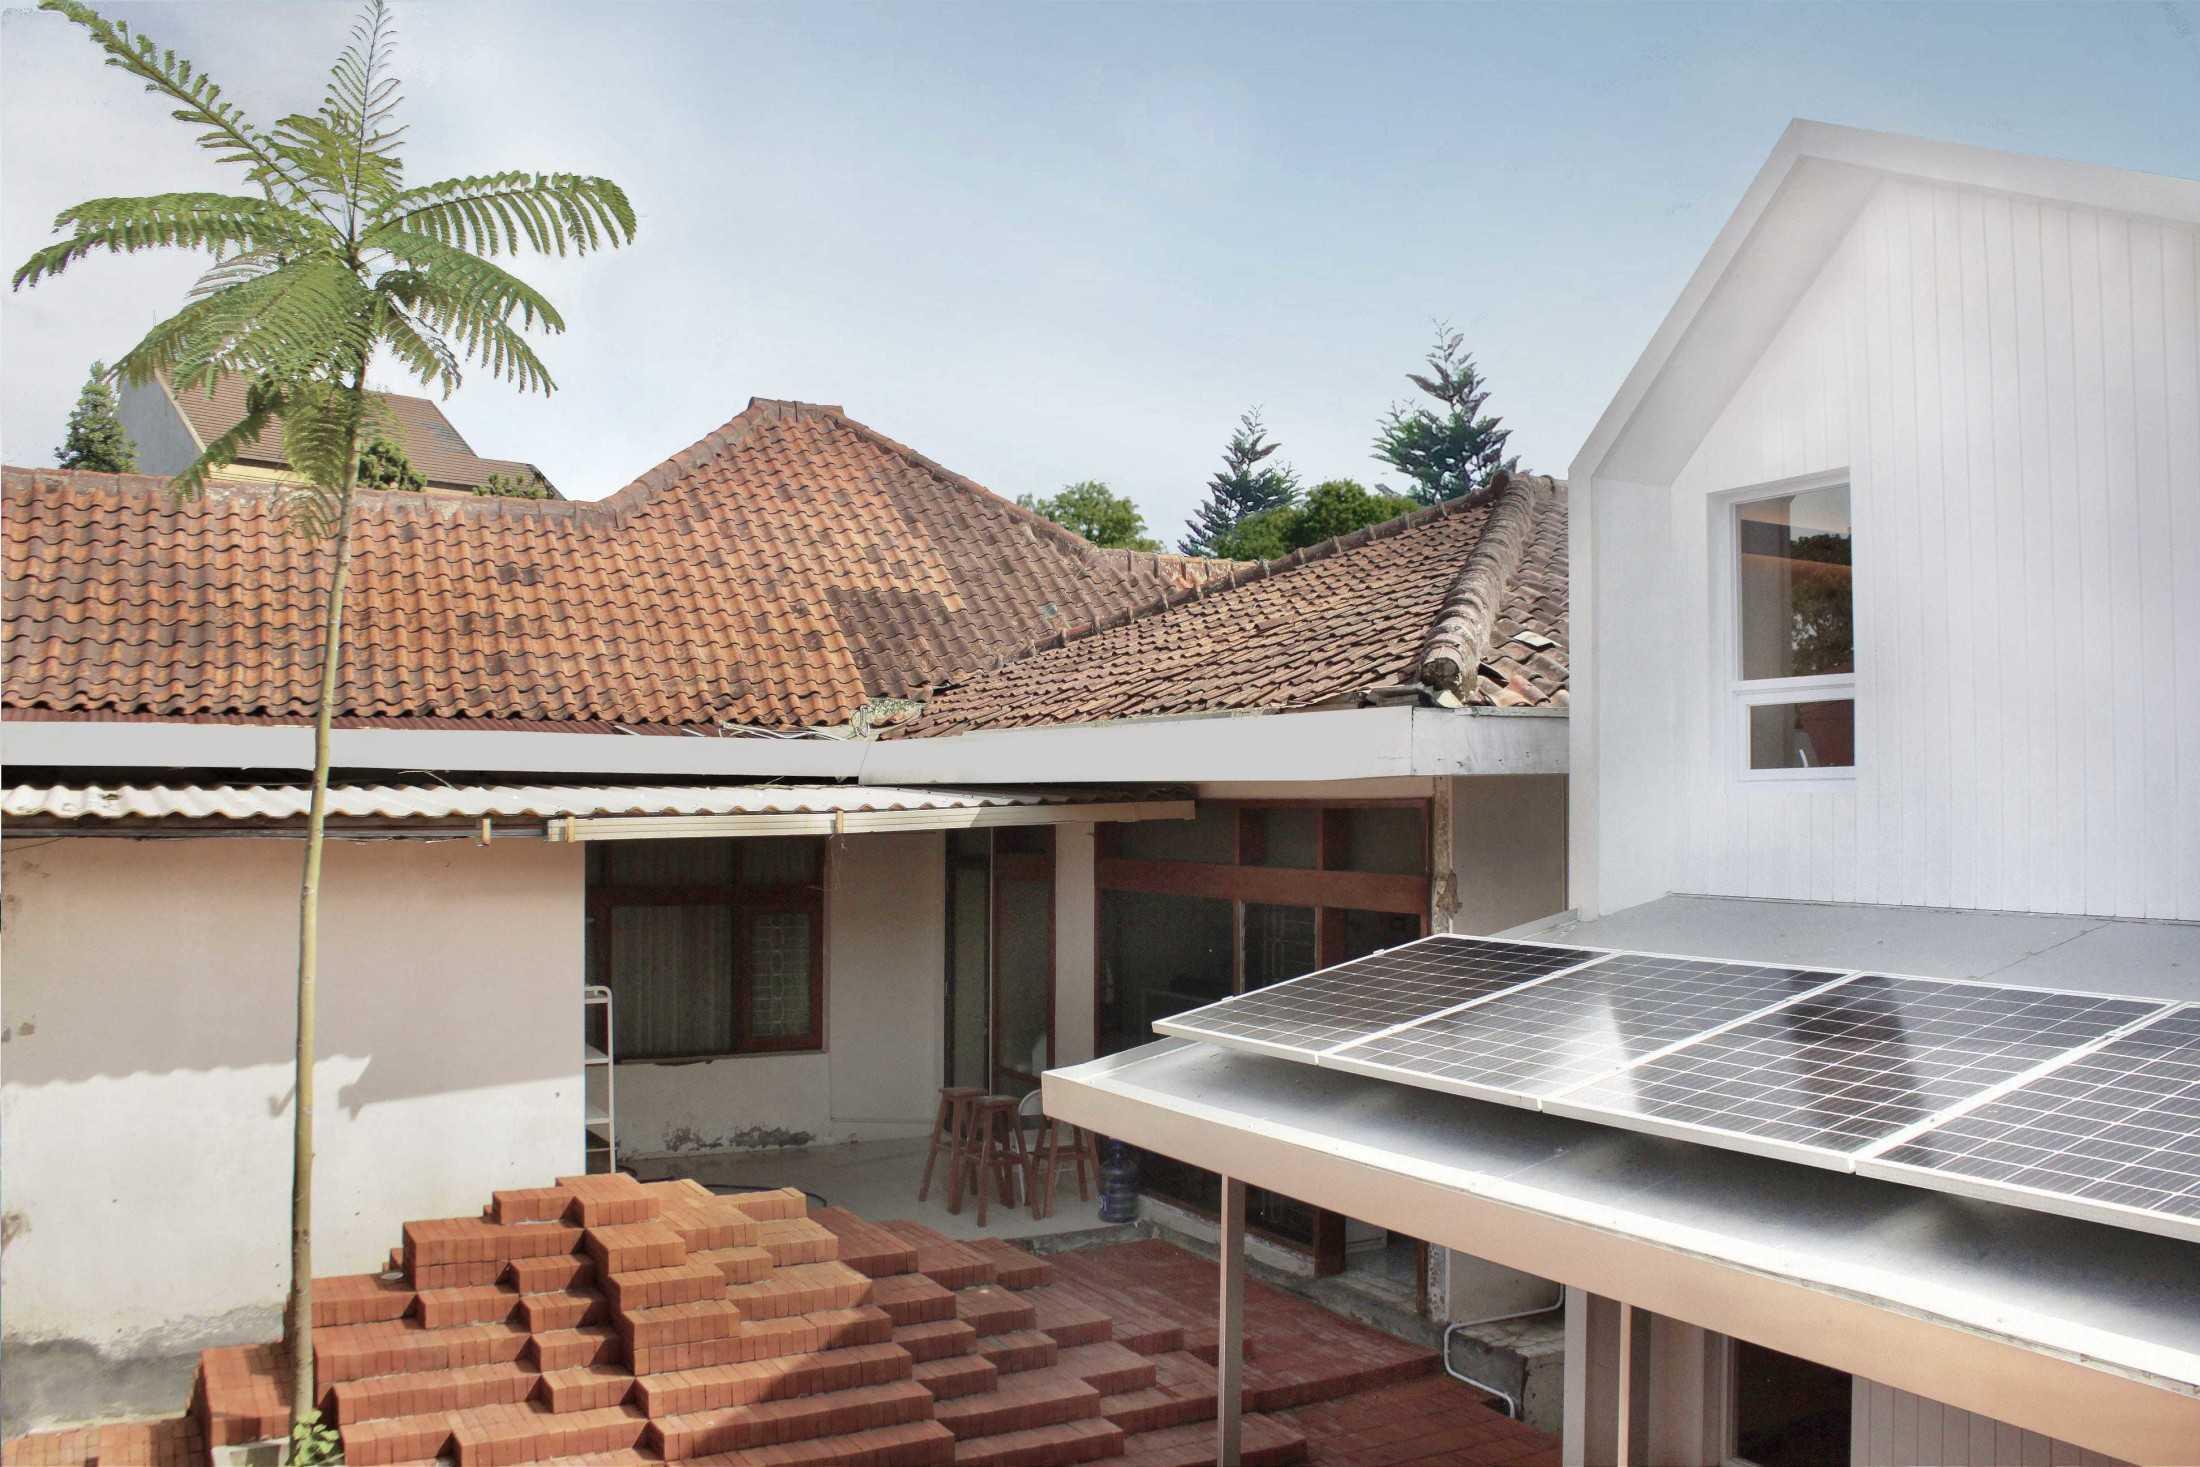 Aaksen Responsible Aarchitecture Home-Office Pods Aand Sayana Bandung, Kota Bandung, Jawa Barat, Indonesia Bandung, Kota Bandung, Jawa Barat, Indonesia Aaksen-Responsible-Aarchitecture-Home-Office-Pods-Aand-Sayana  89654